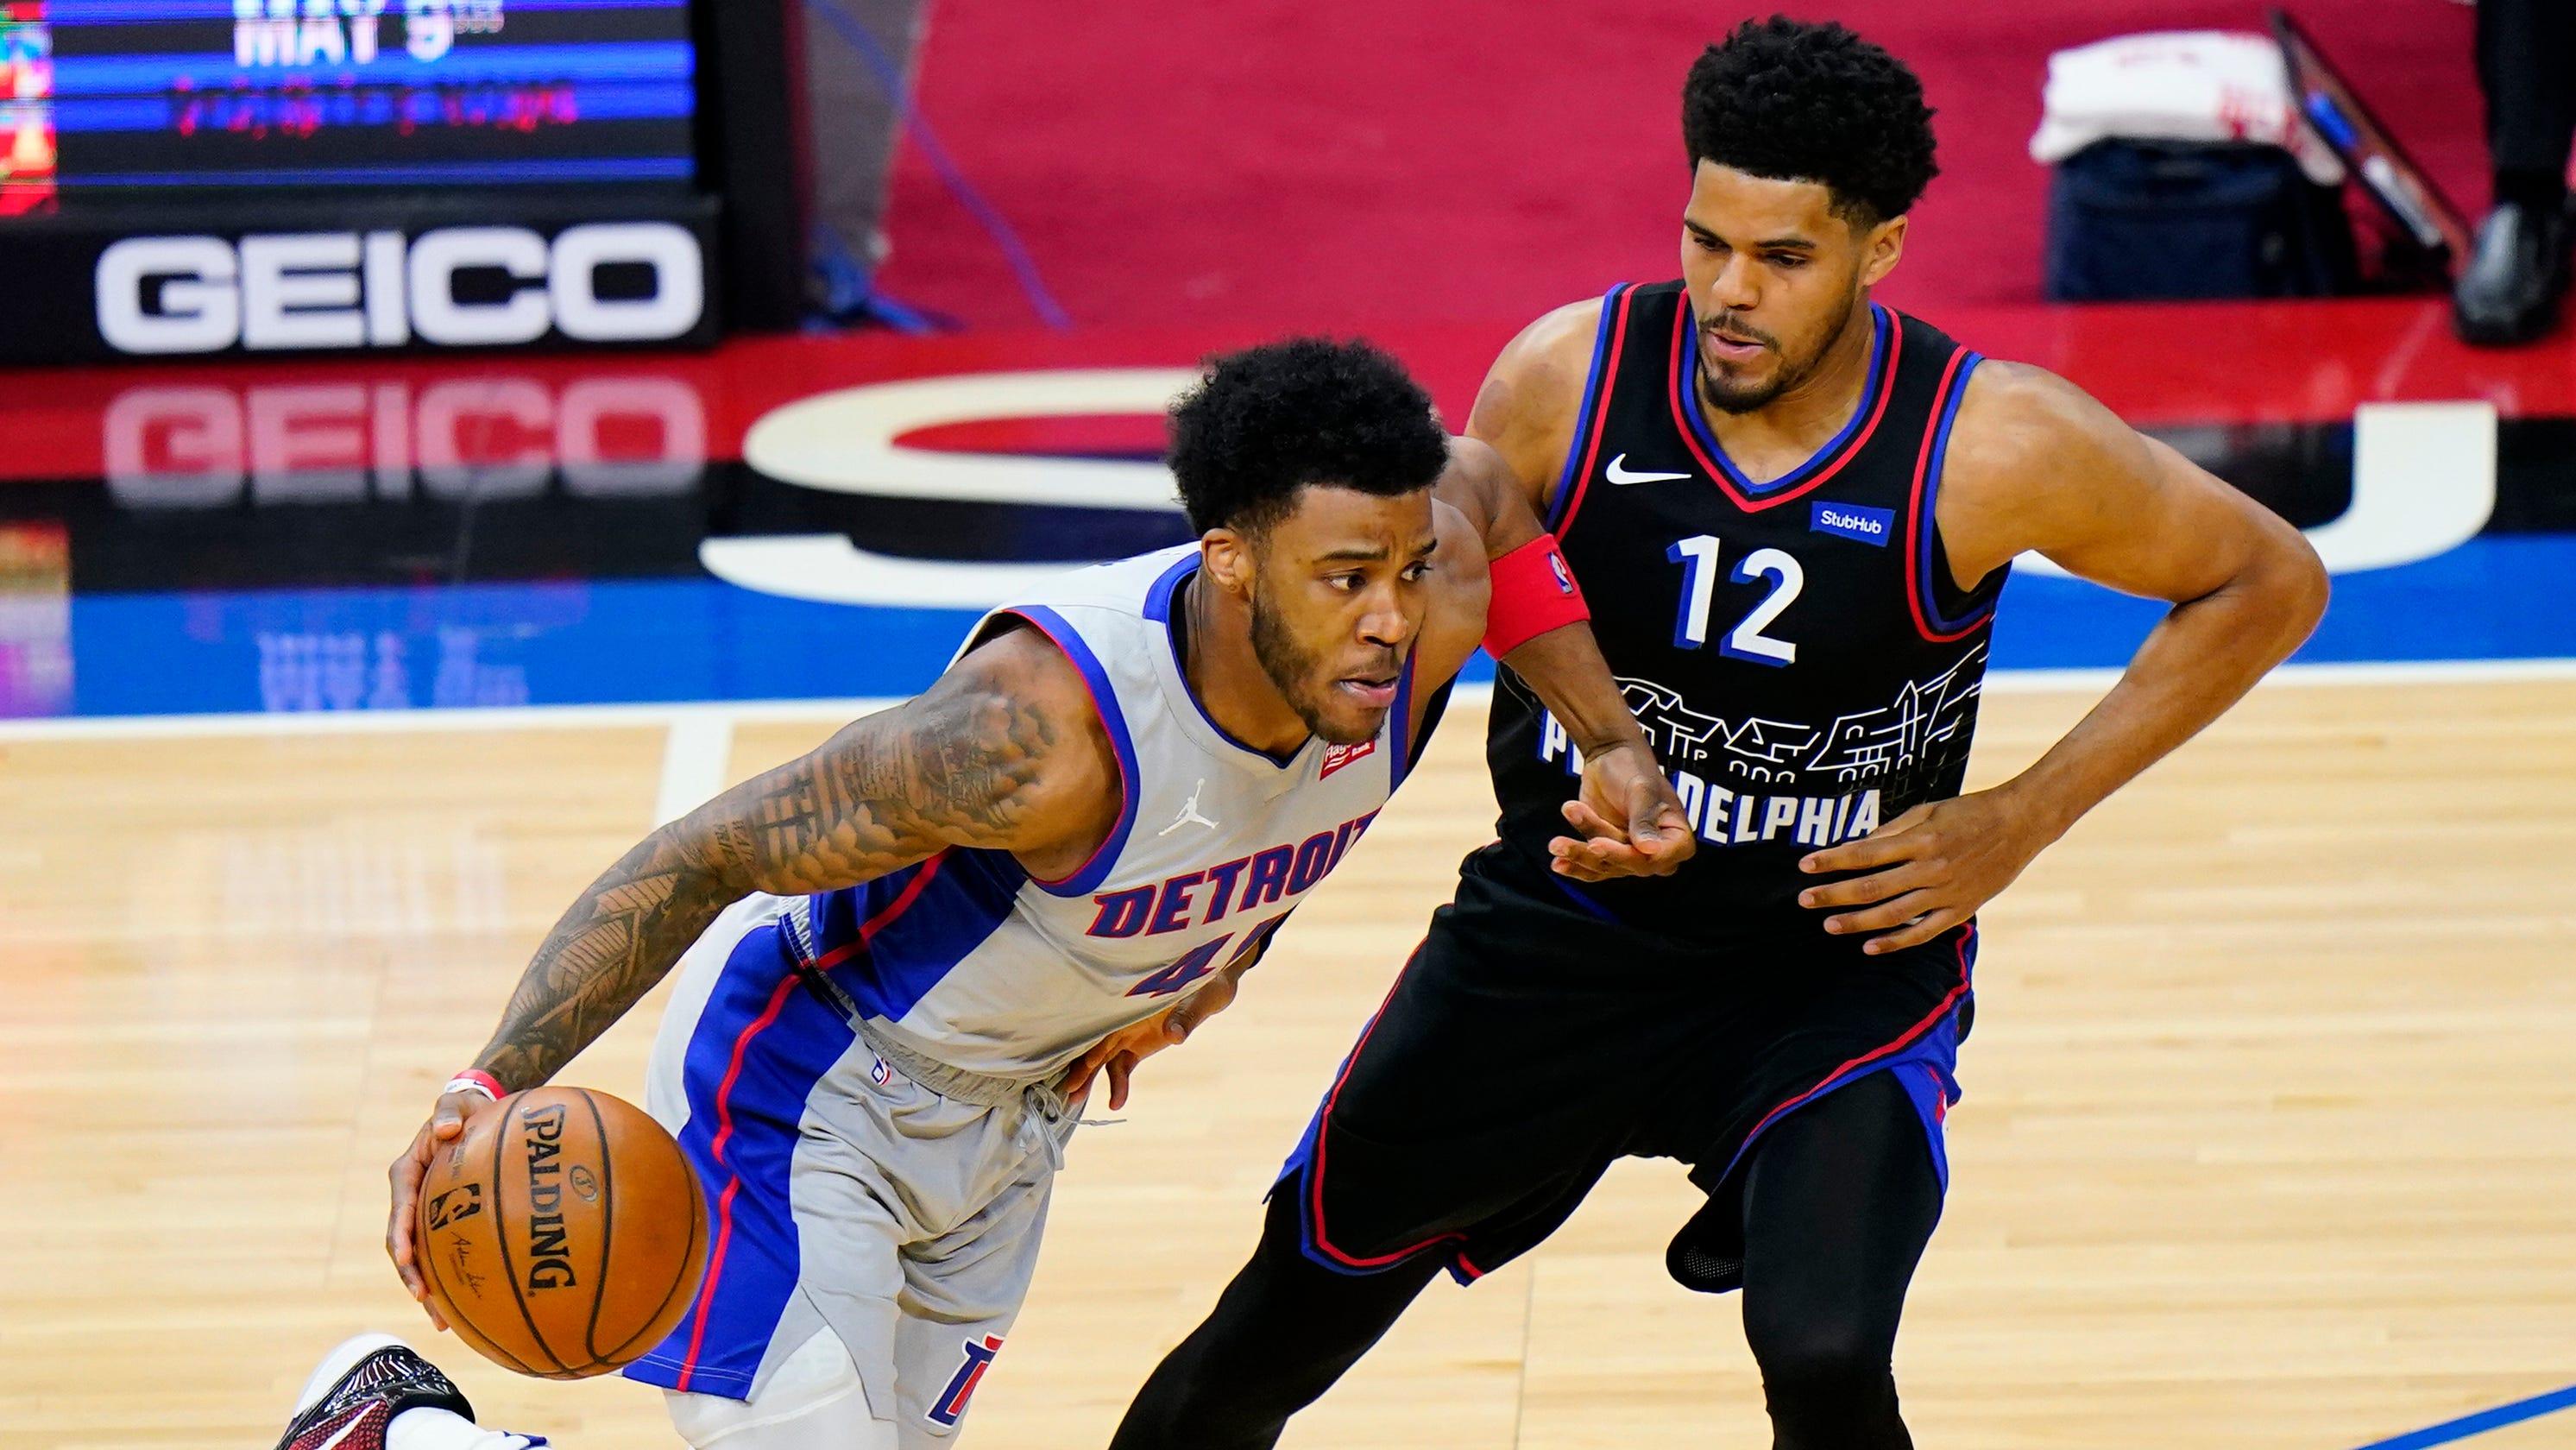 Jerami Grant and Mason Plumlee return, but Detroit Pistons fall to Philadelphia 76ers, 118-104